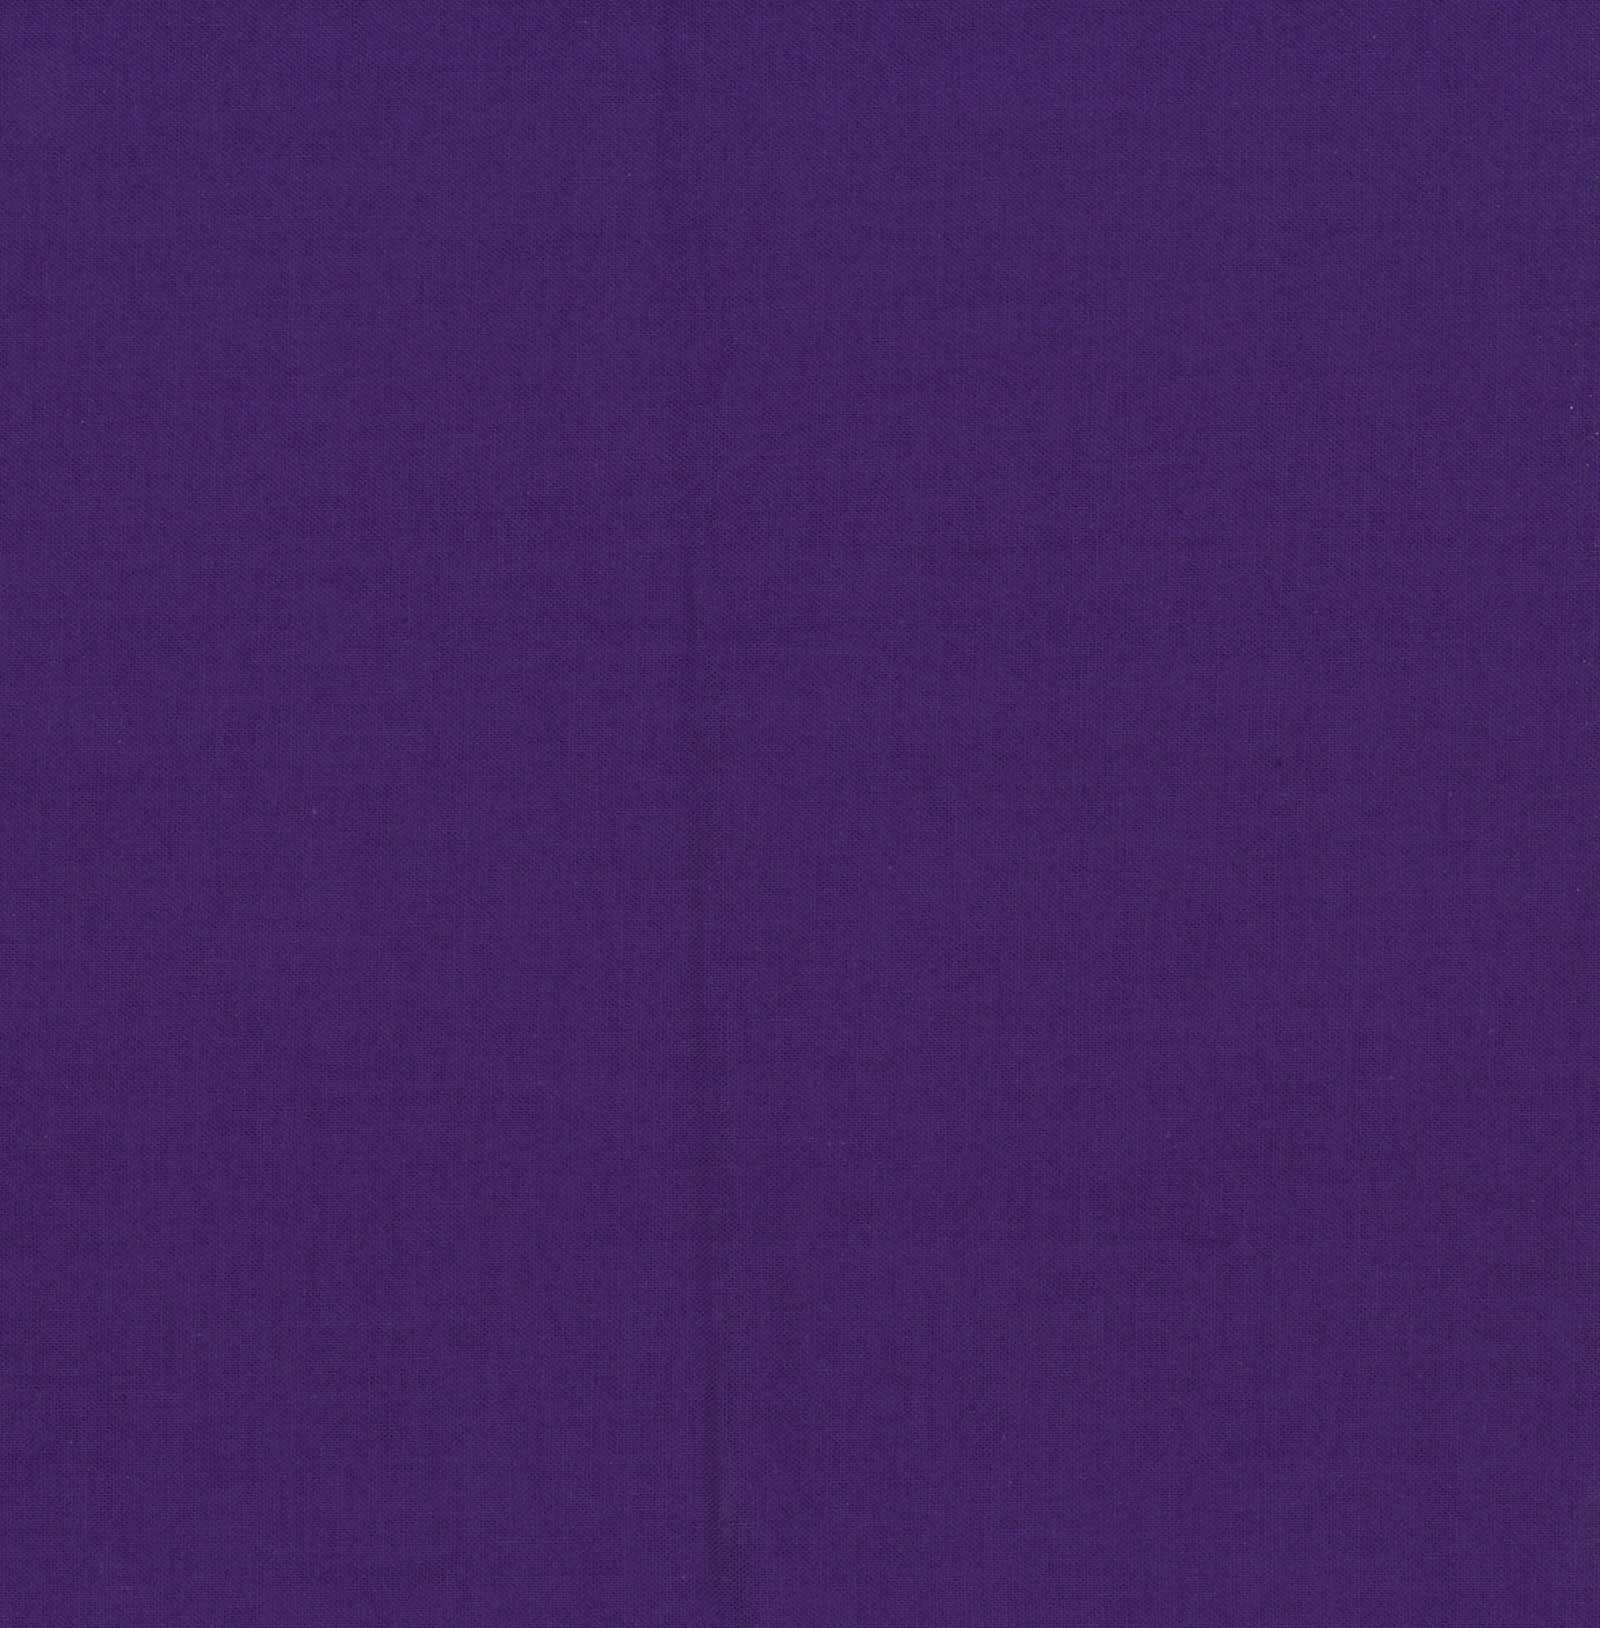 Oasis Solid  Regal Purple